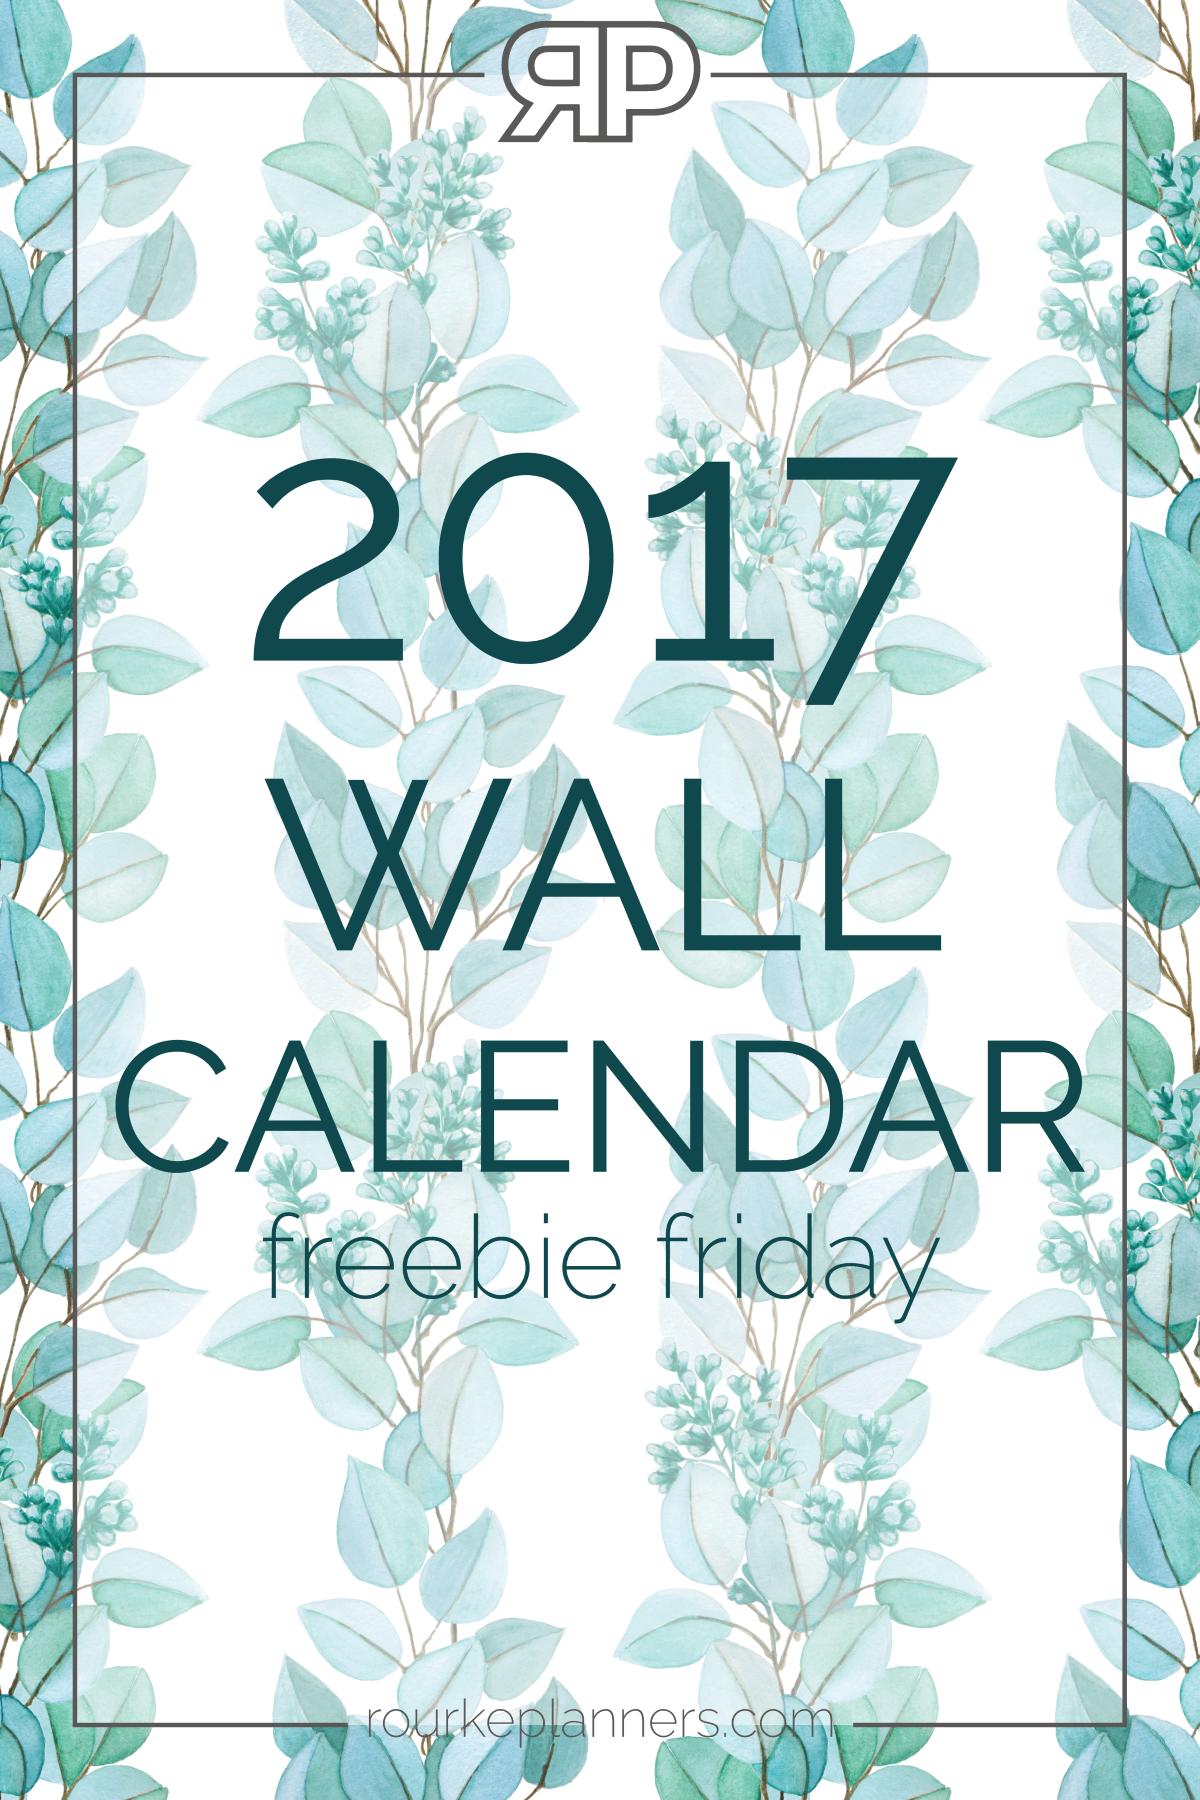 2017 Wall Calendar   Freebie Friday   Rourke Planners